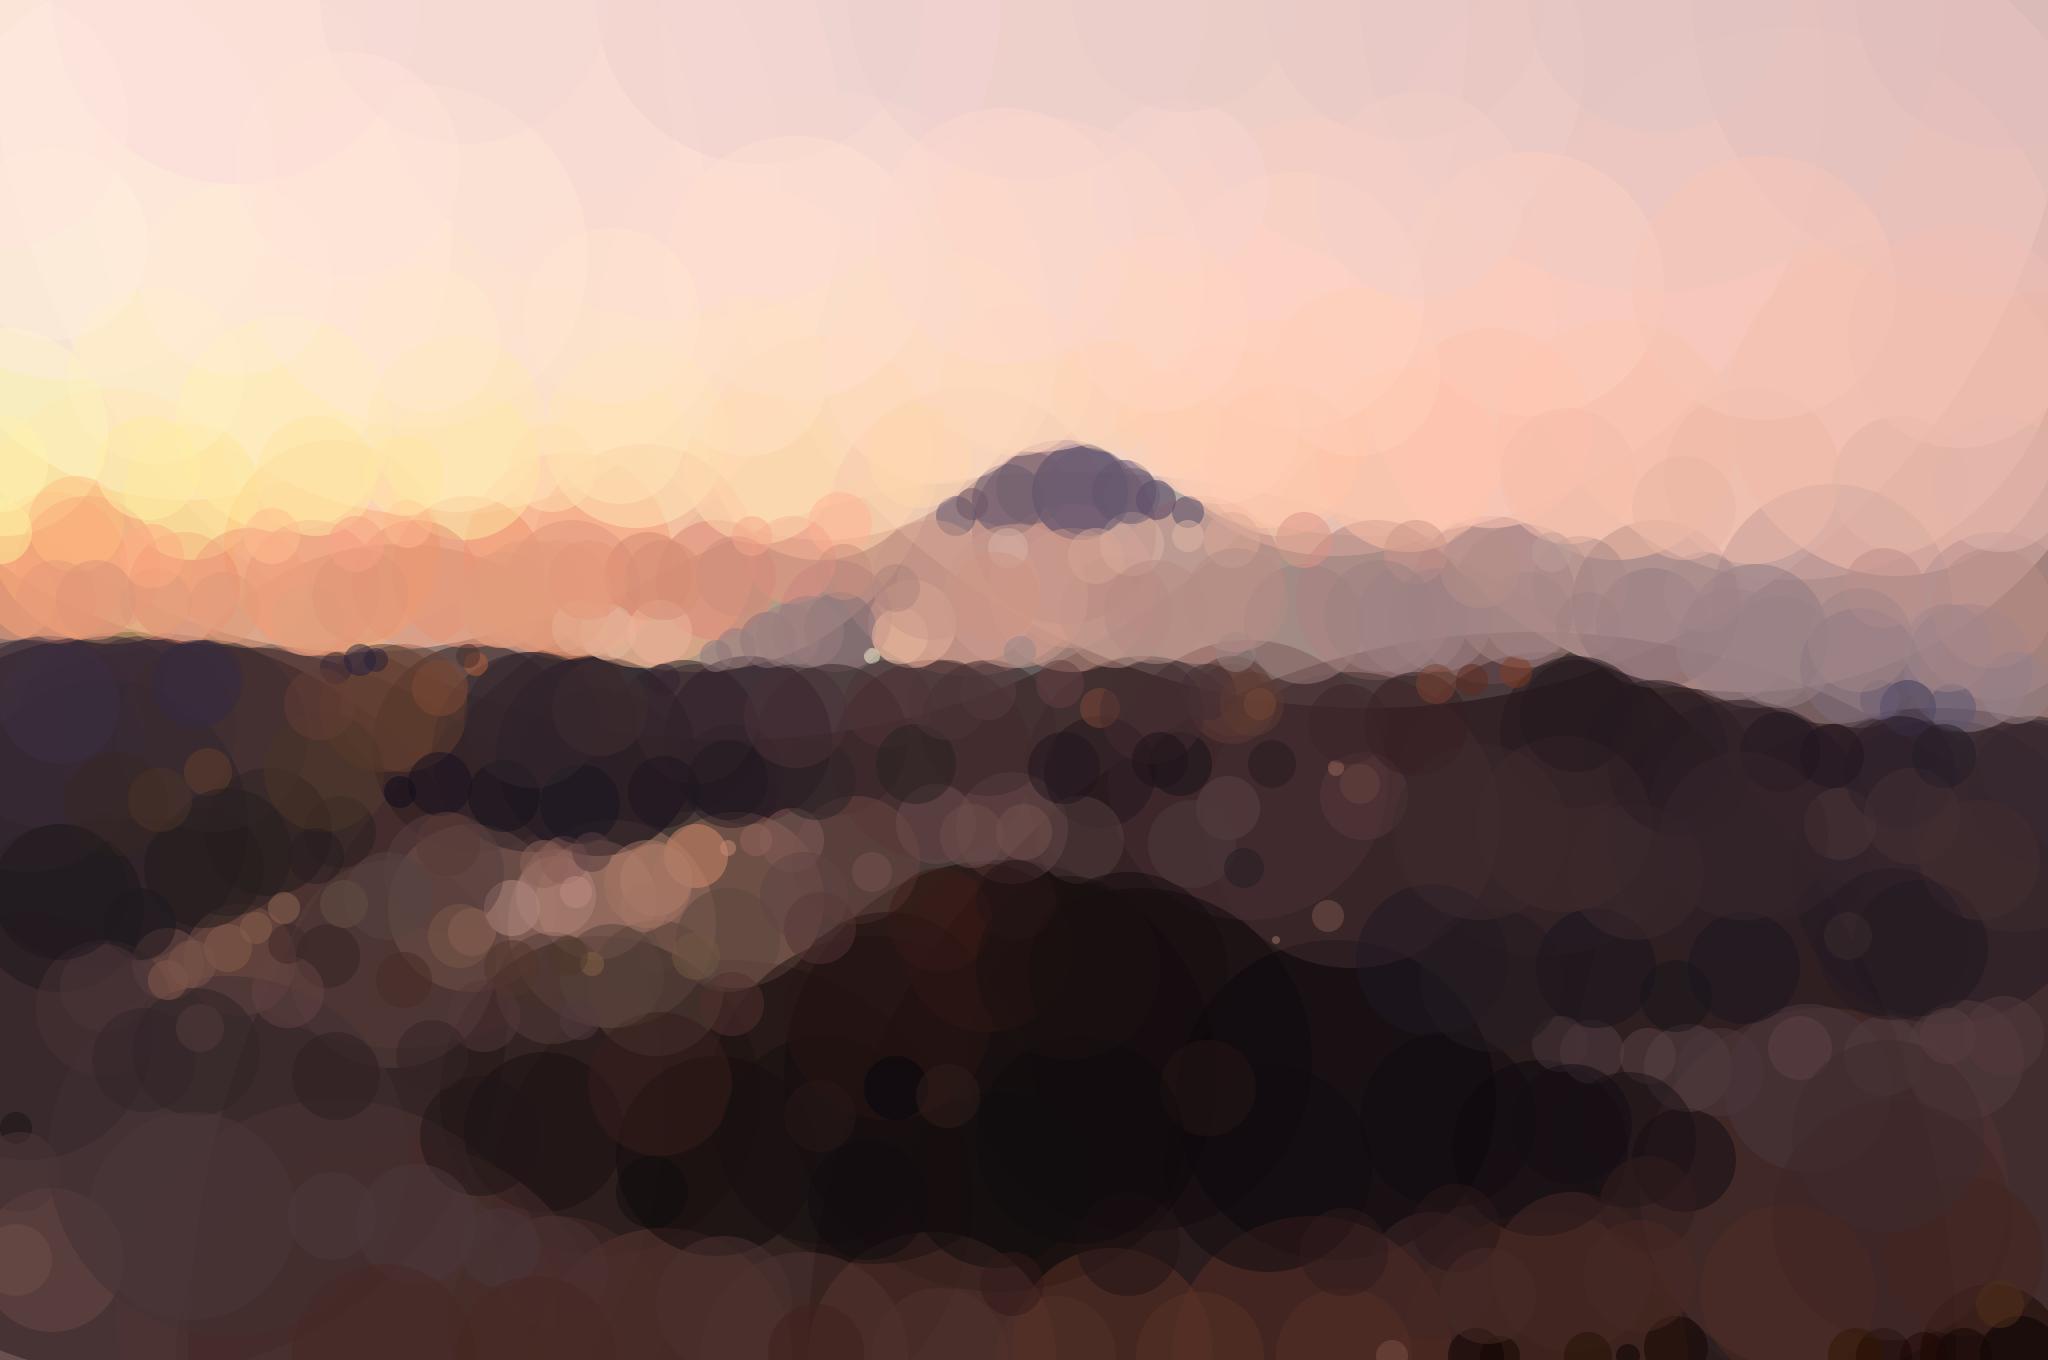 geometrized_mountain